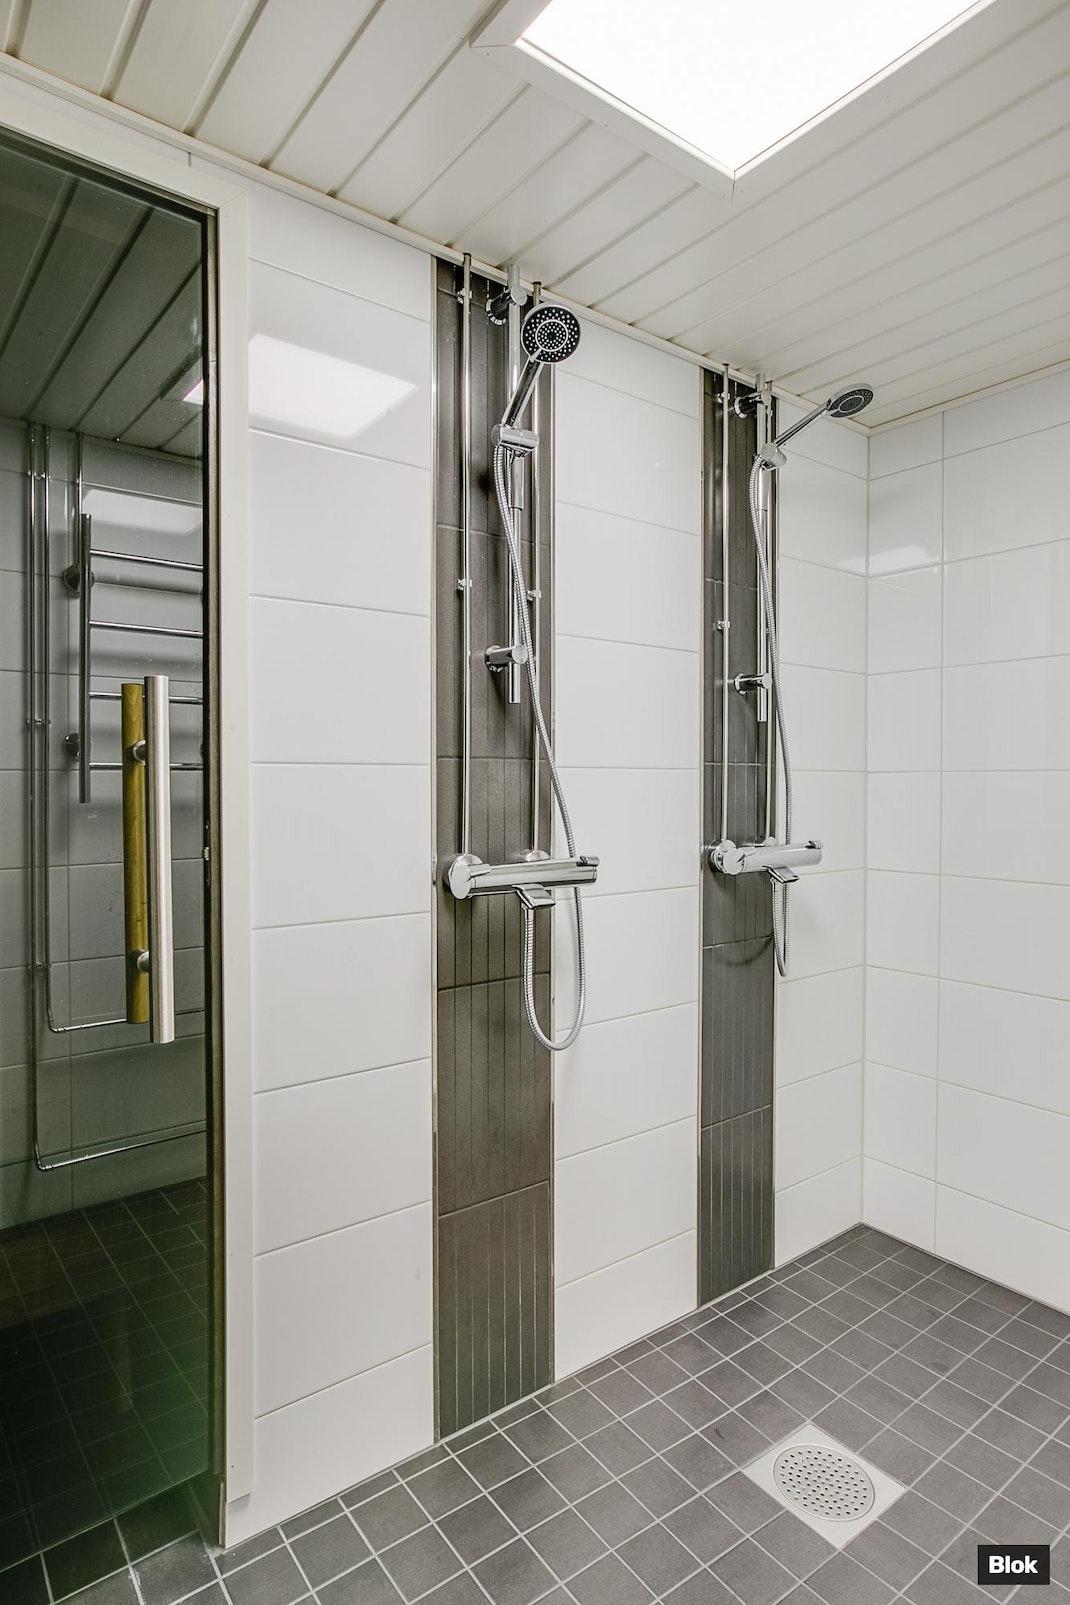 Liljankuja 5 B 1 Kylpyhuone & Sauna & Erillinen WC